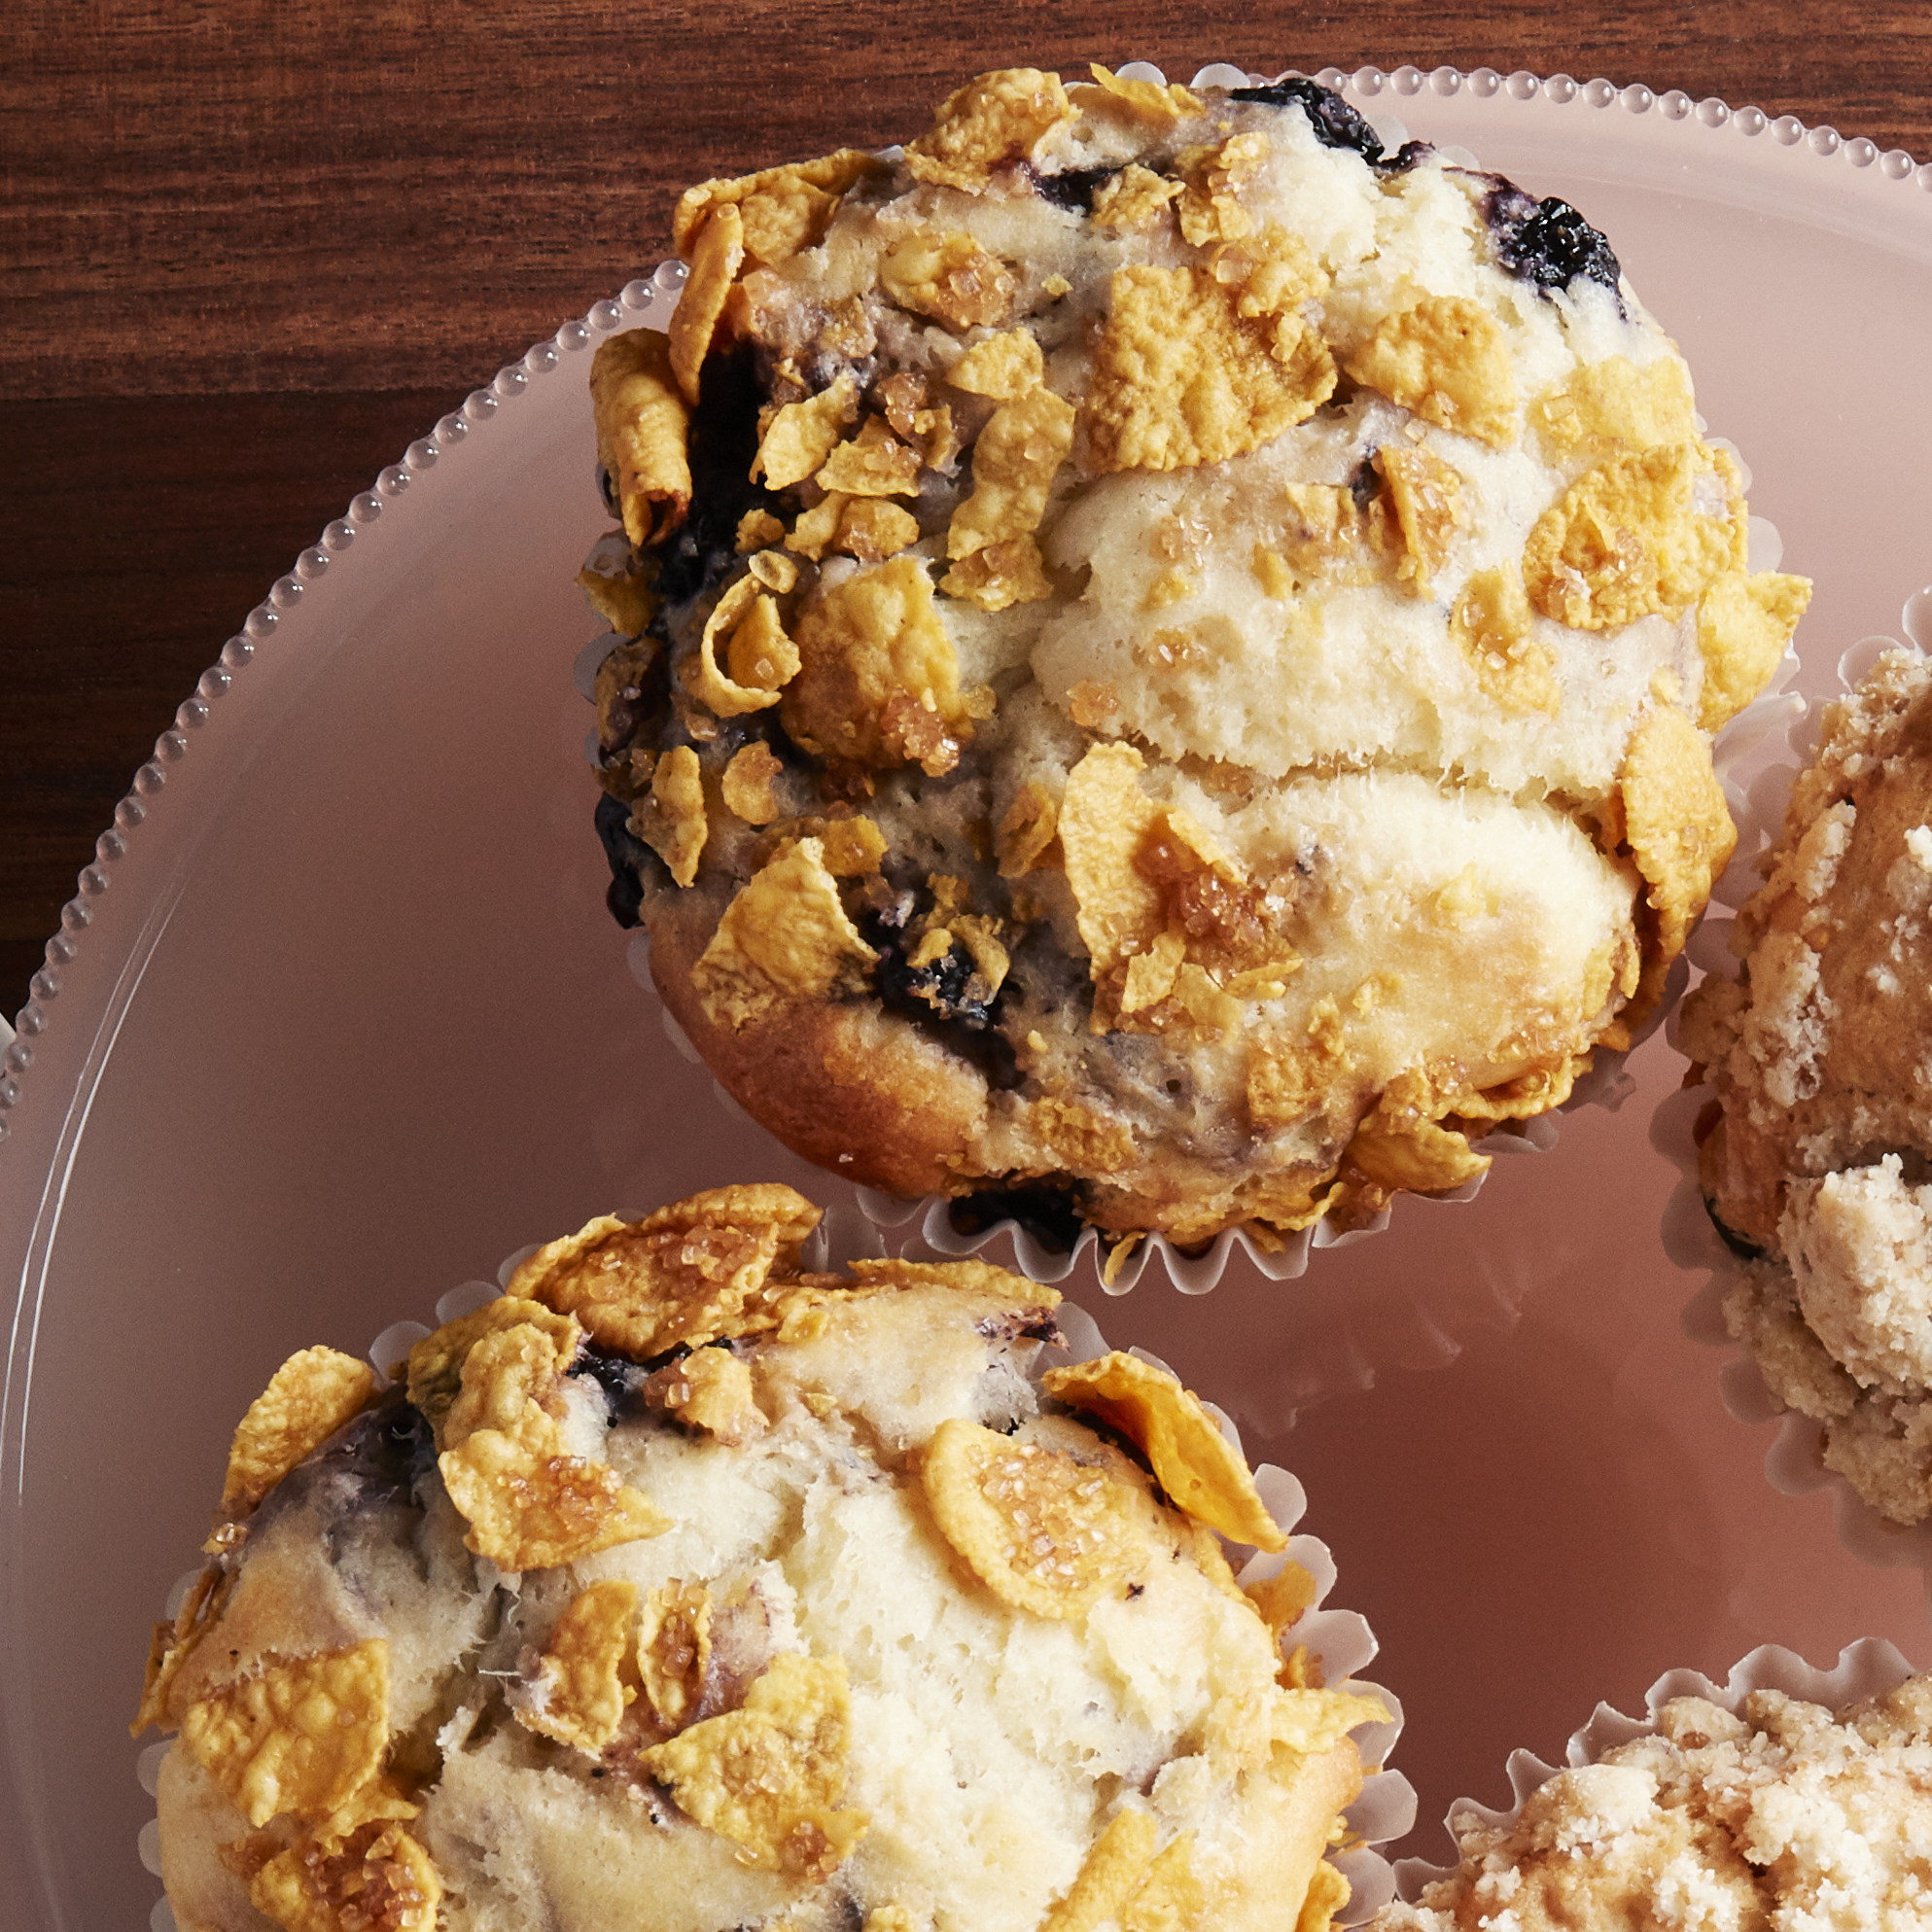 Blueberry Cornflake Muffin